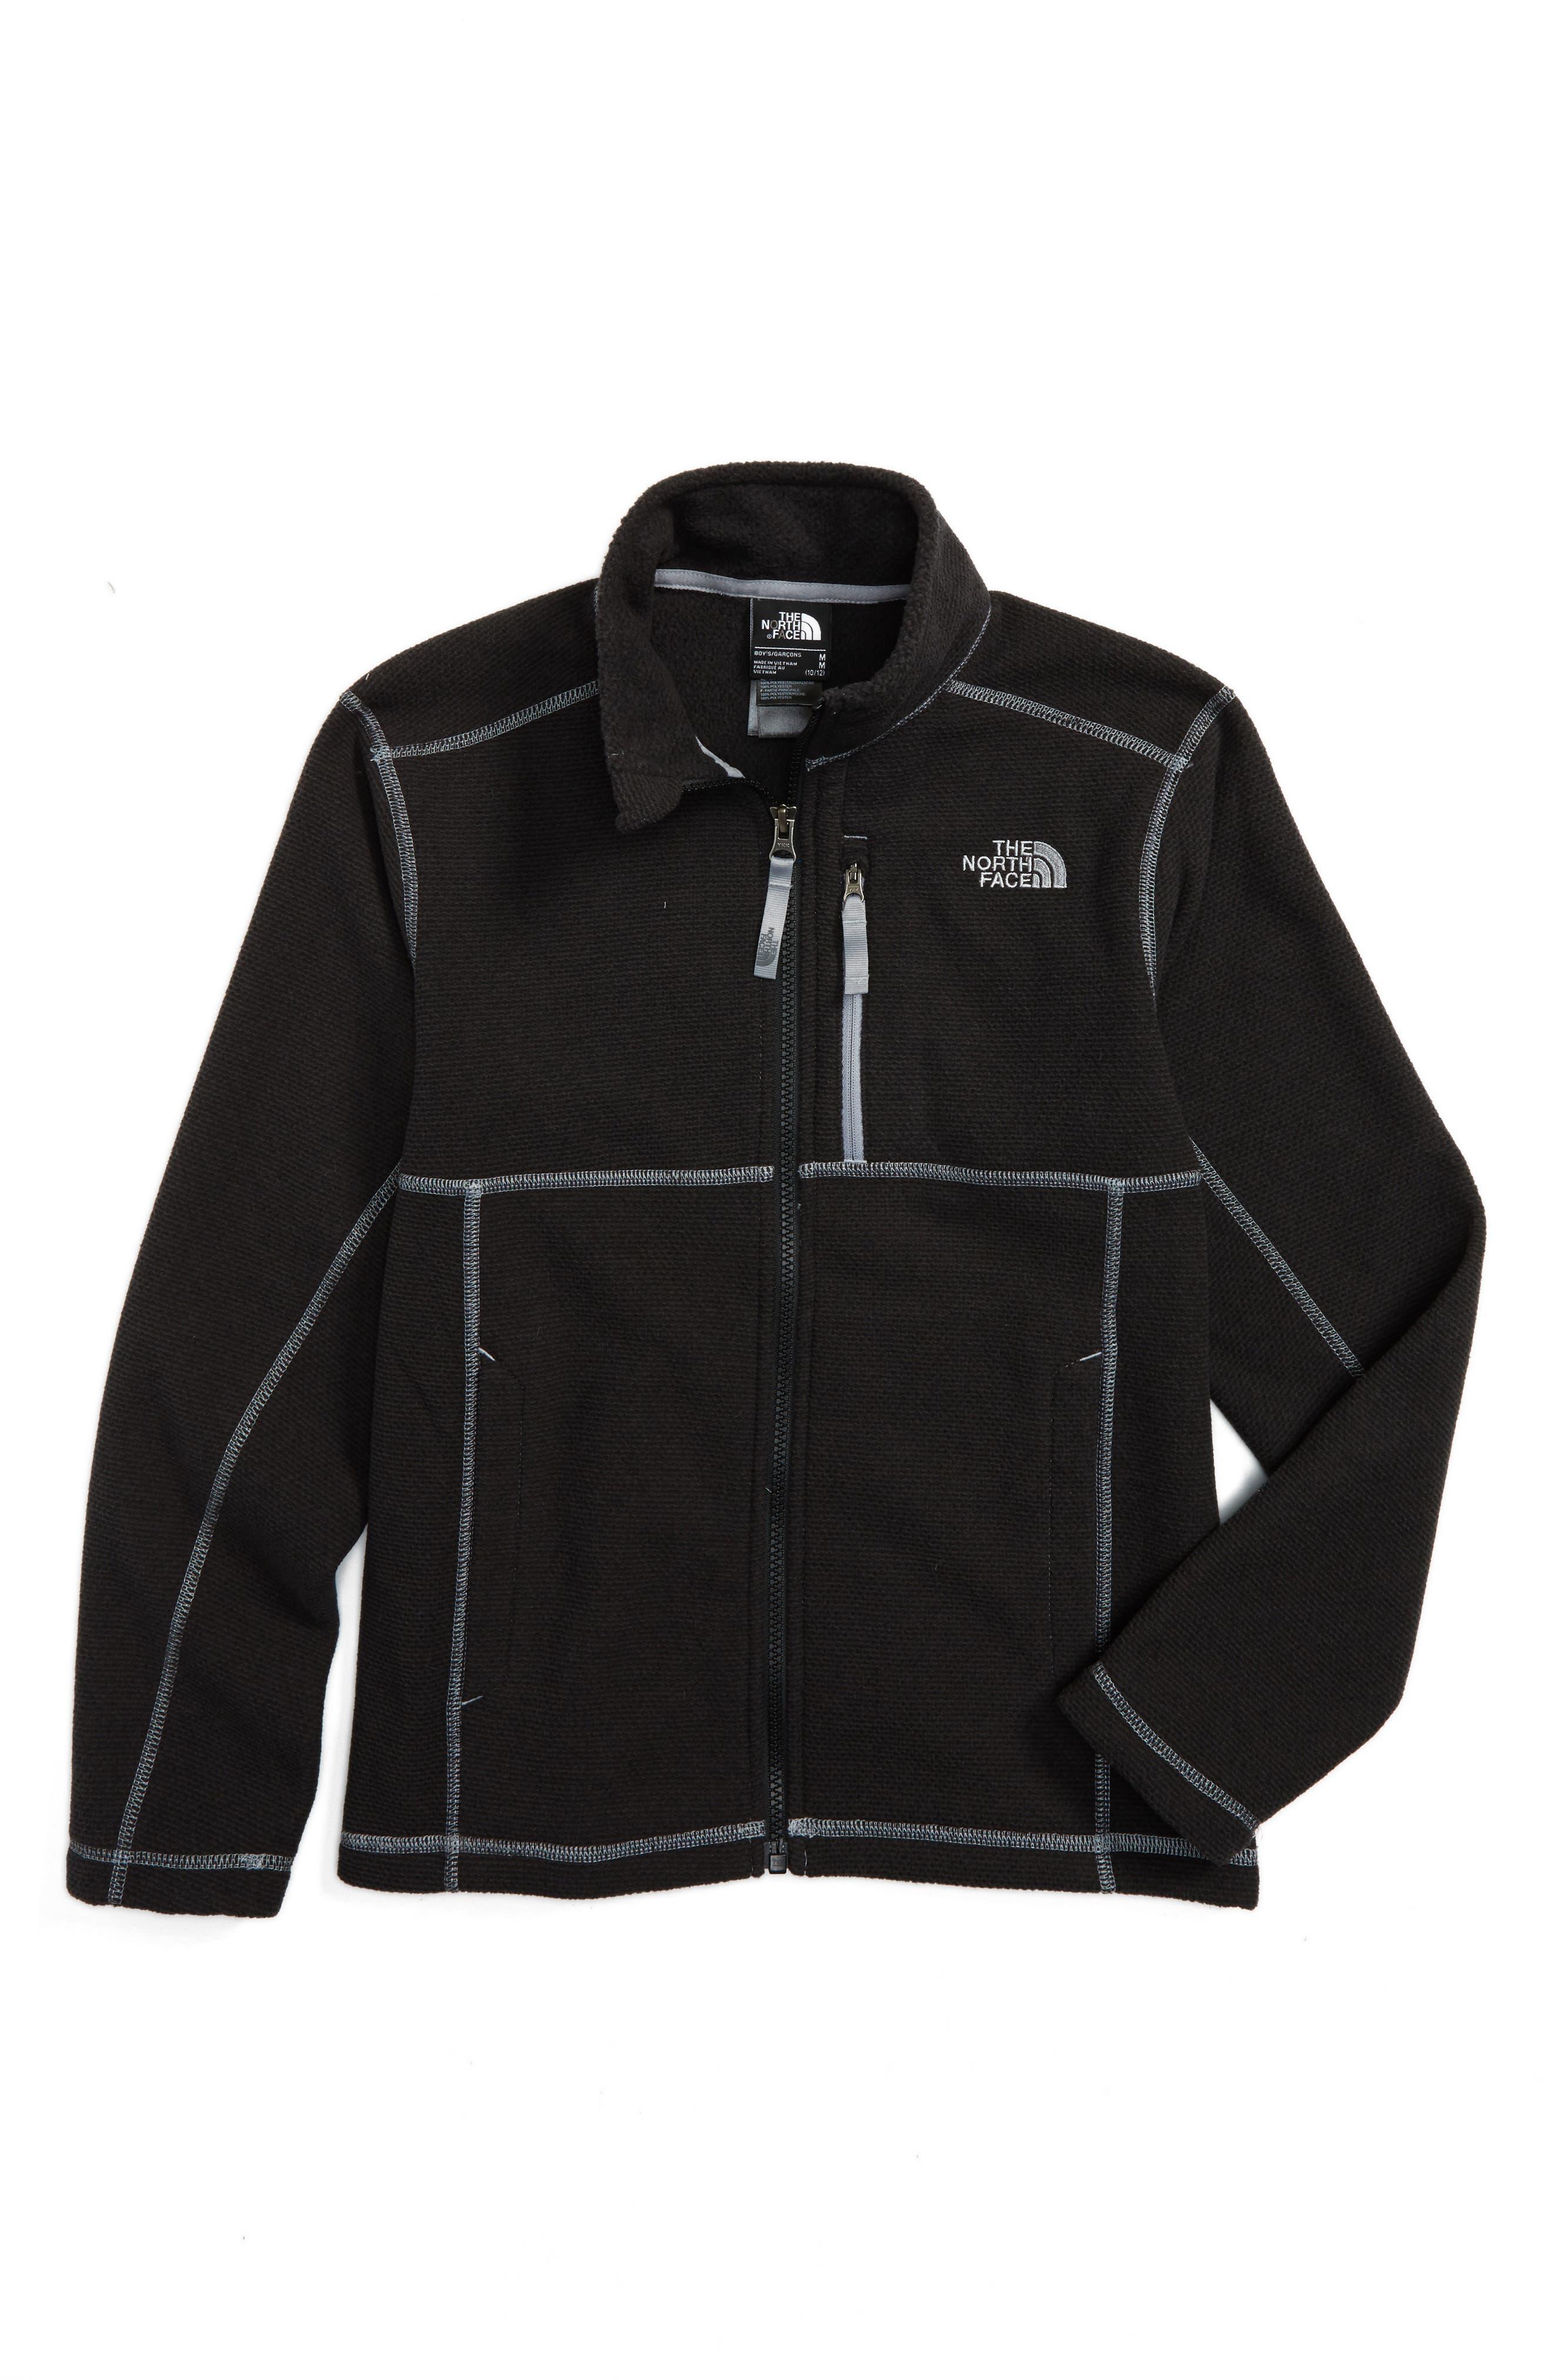 Alternate Image 1 Selected - The North Face Cap Rock Fleece Jacket (Big Boys)